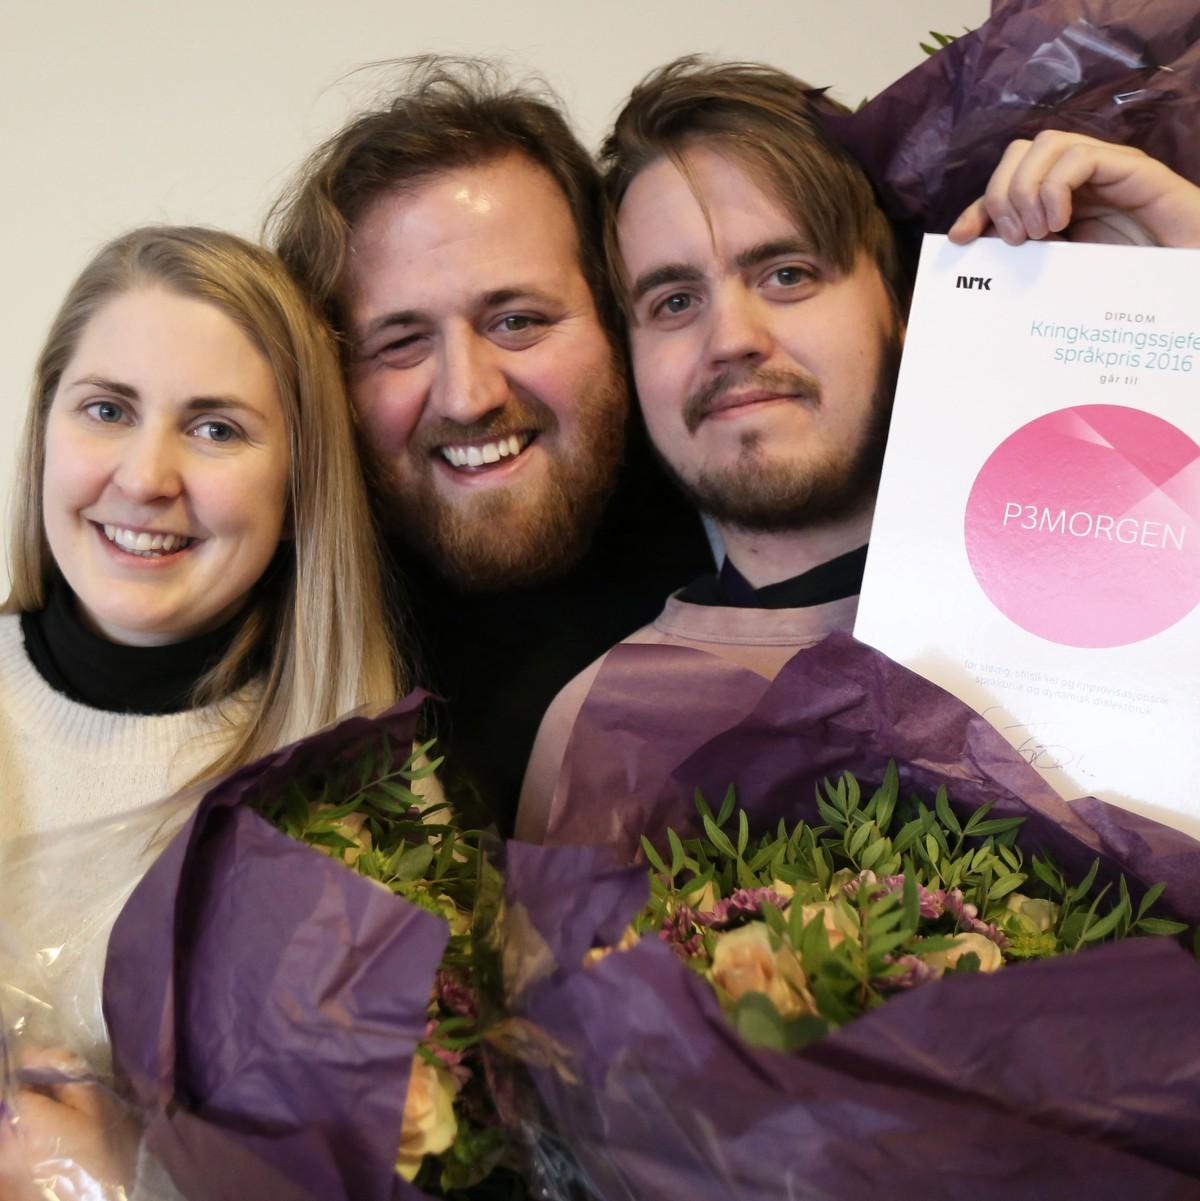 P3morgen Far Kringkastingssjefens Sprakpris Nrk Kultur Og Underholdning